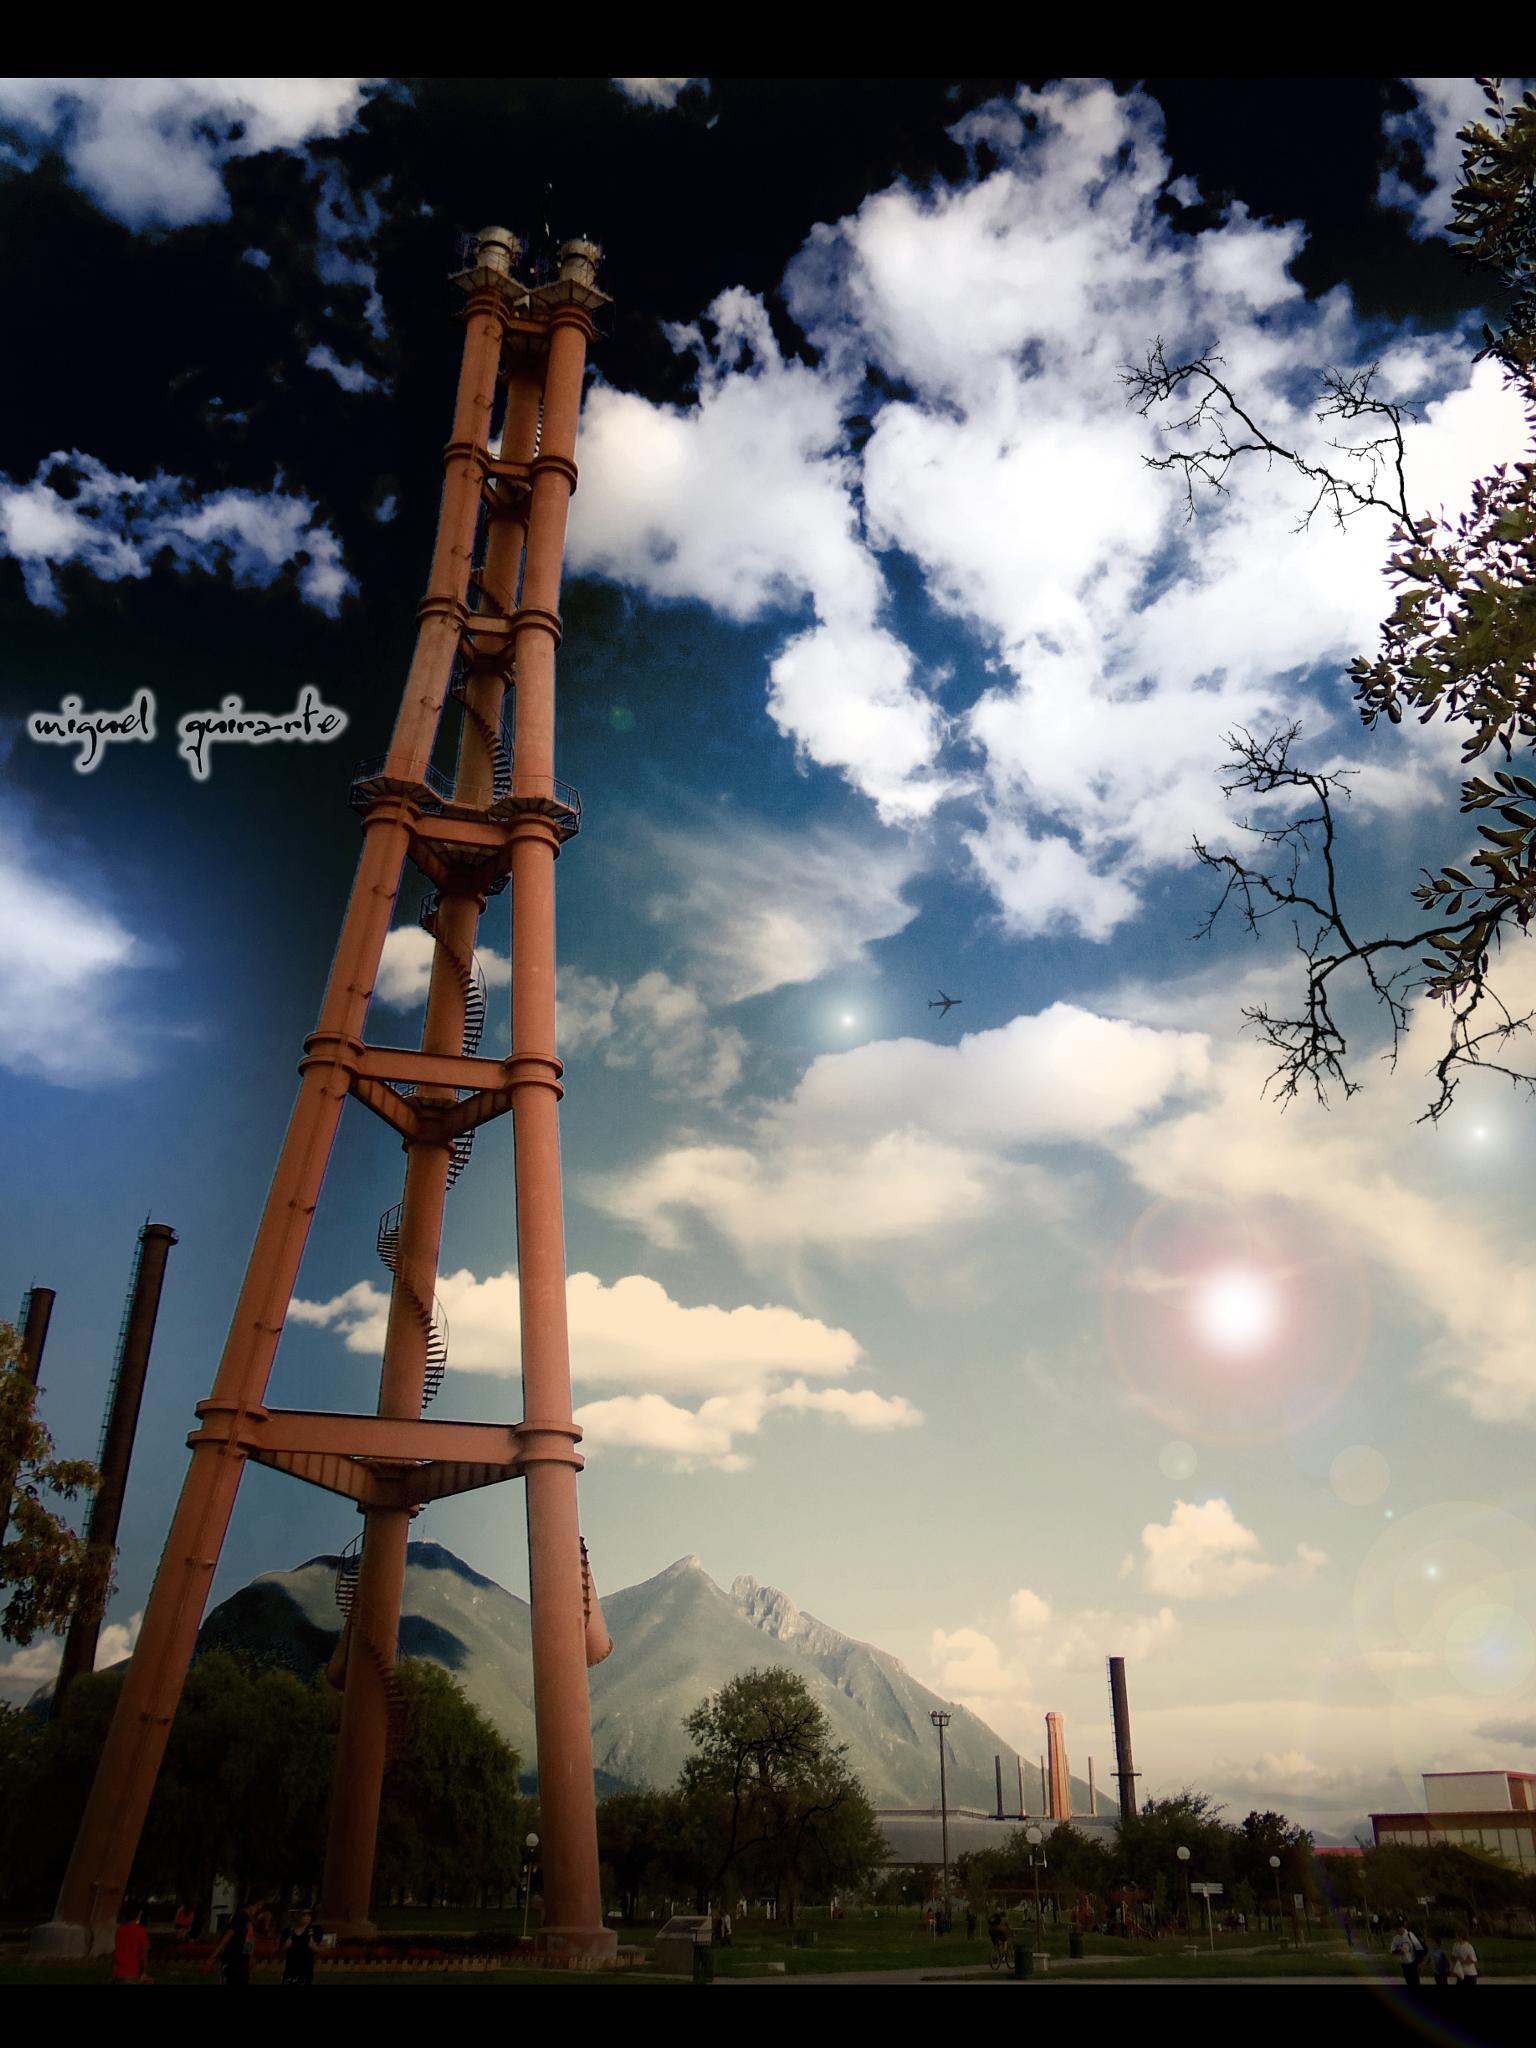 FUNDIDORA PARK by MIGUEL QUIRARTE